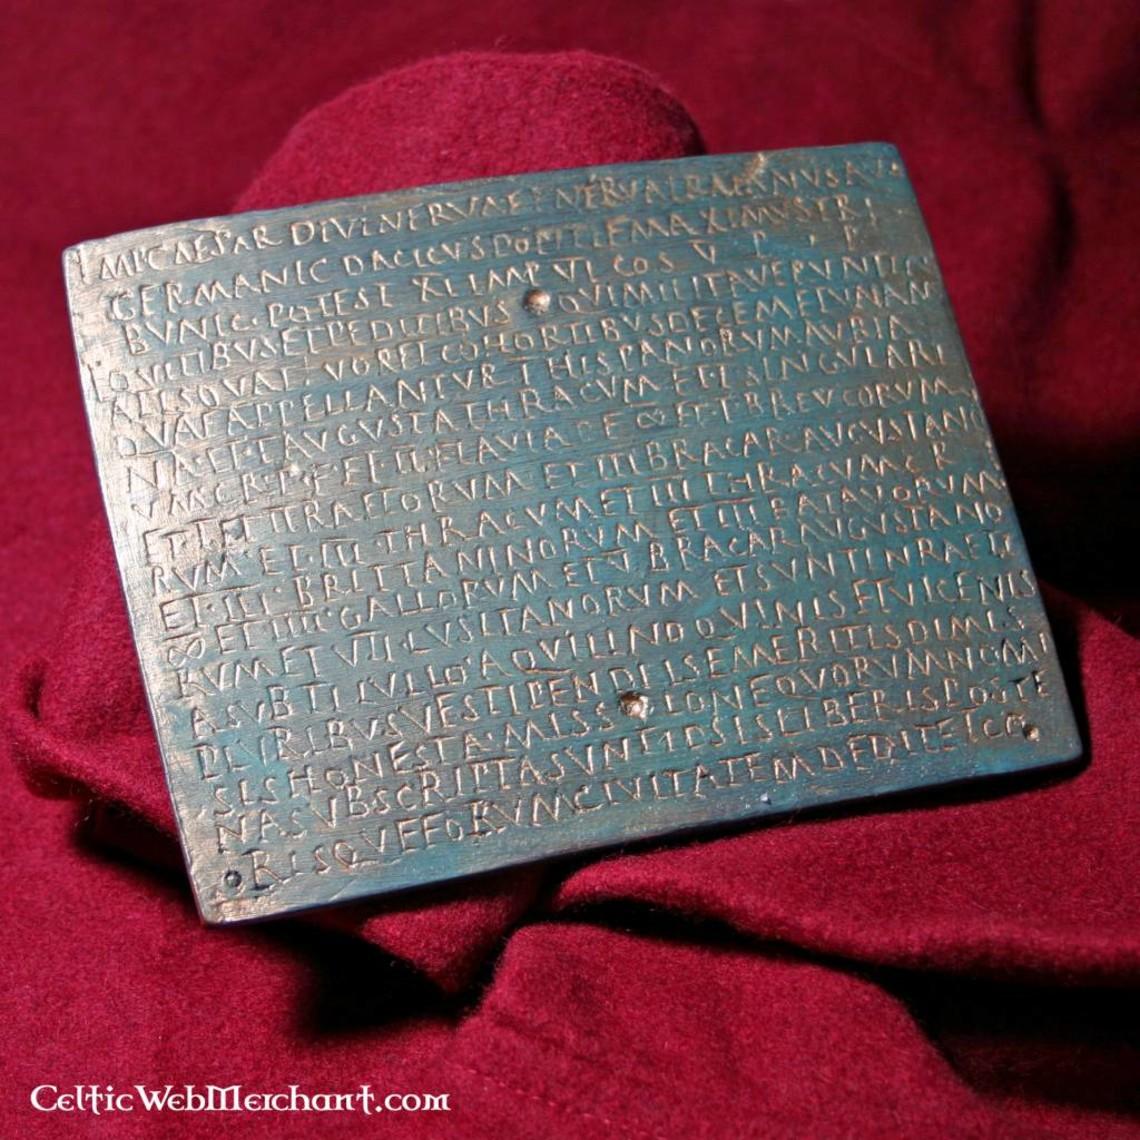 Romeins militair diploma